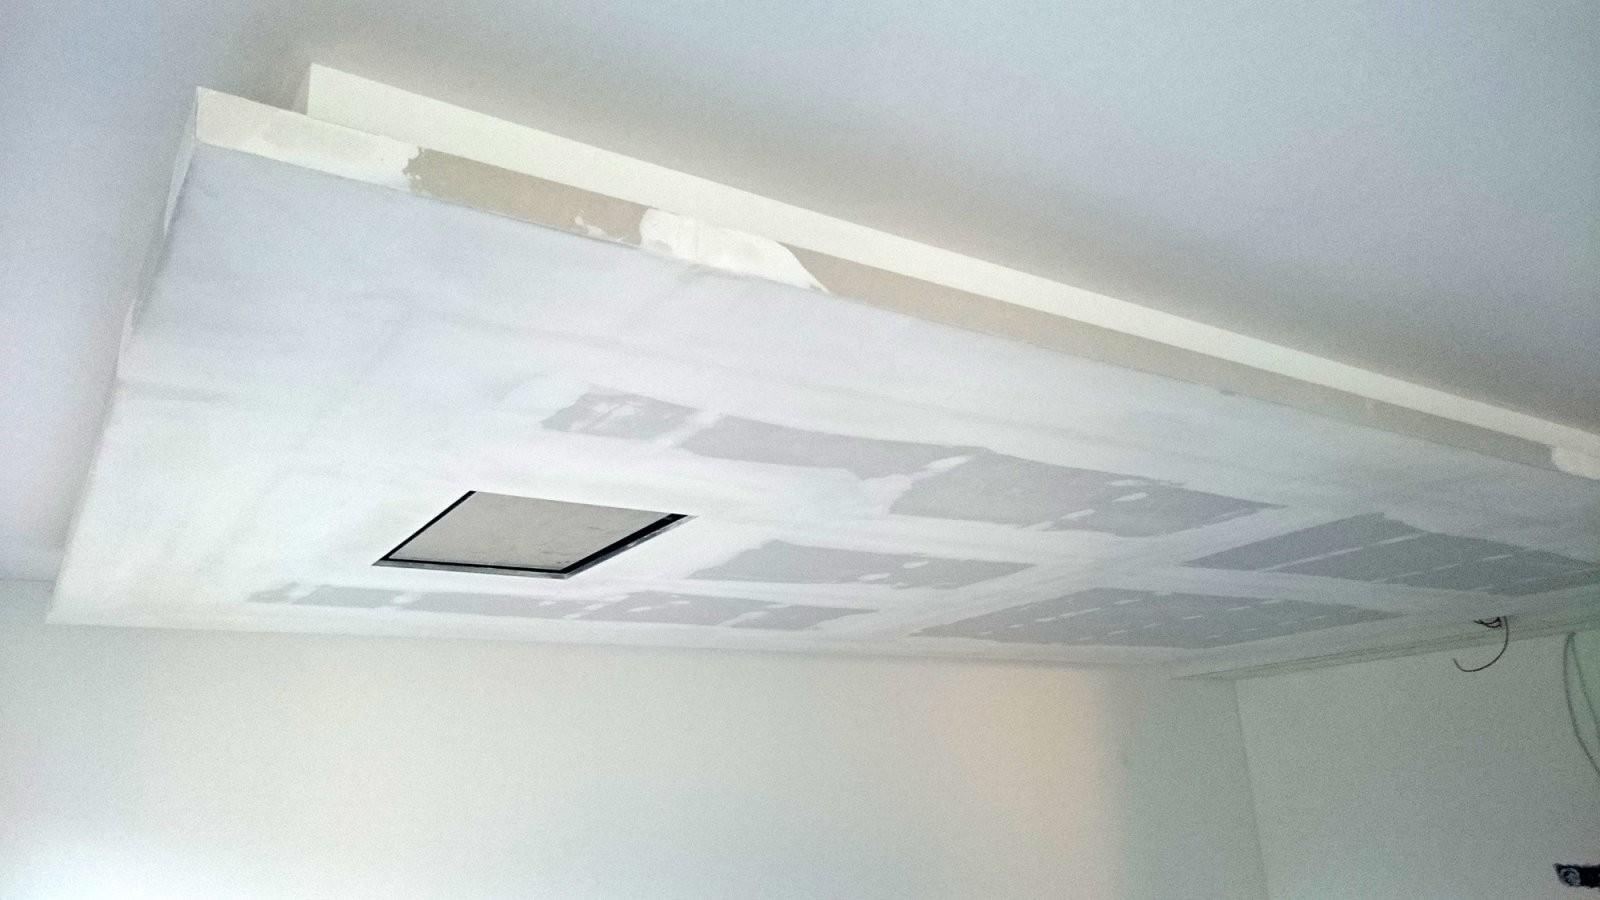 ▷ Abgehängte Decke Mit Indirekter Beleuchtung (Lichtvouten) von Abgehängte Decke Indirekte Beleuchtung Anleitung Photo